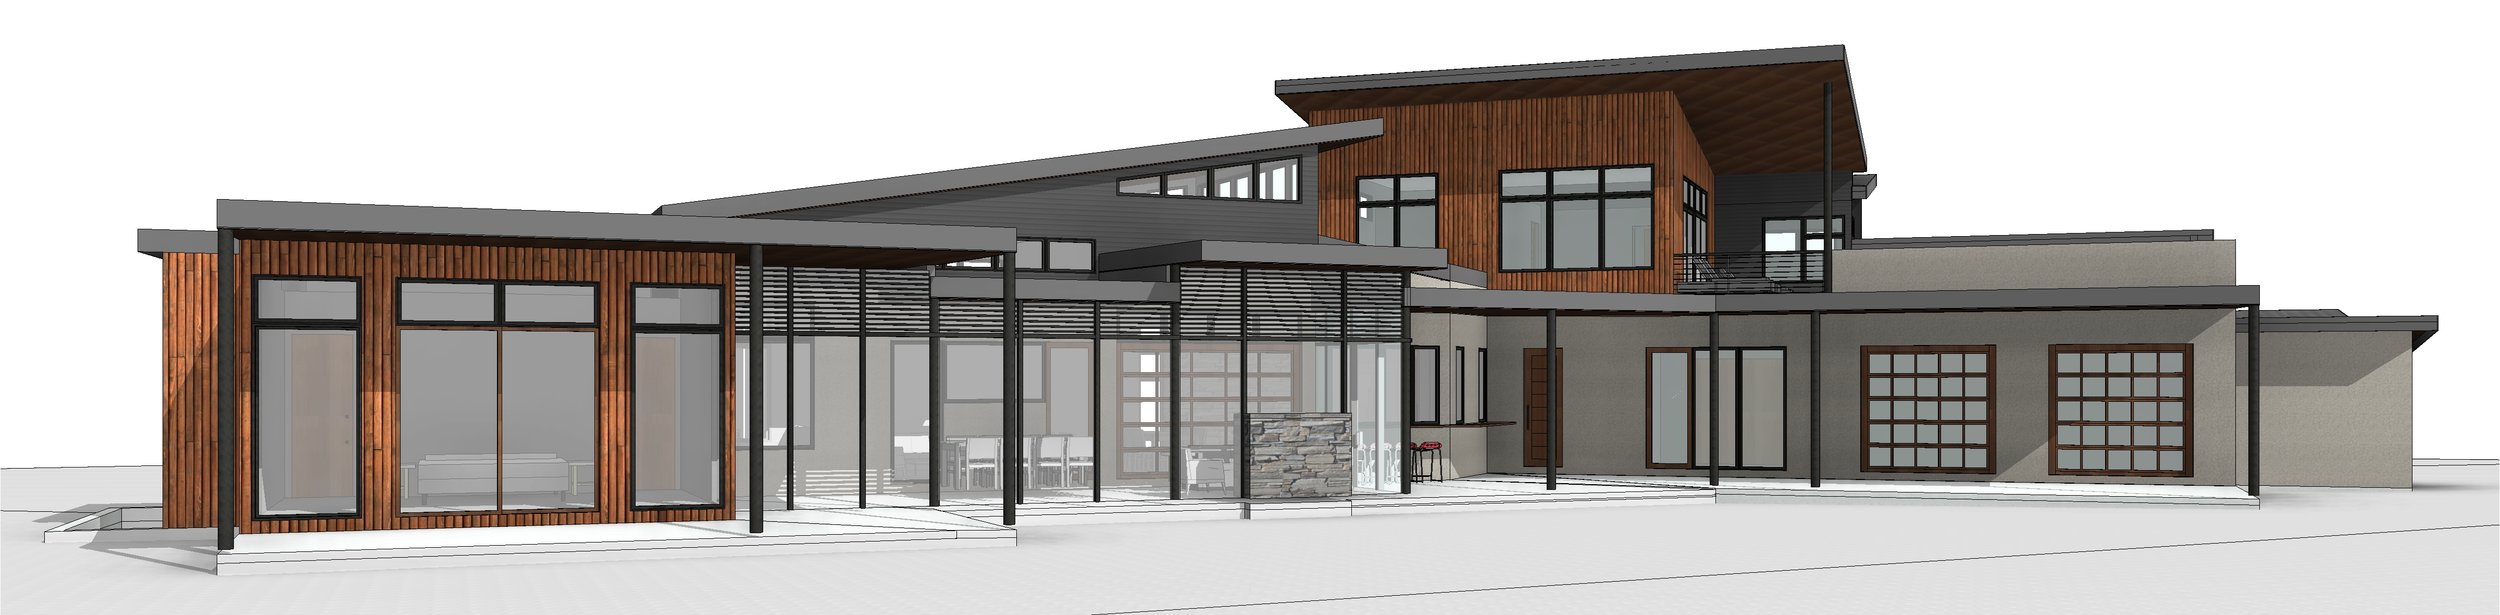 Schreiber Residence - Material Studies 3 - 3D View - REAR PERSPECTIVE 1.jpg